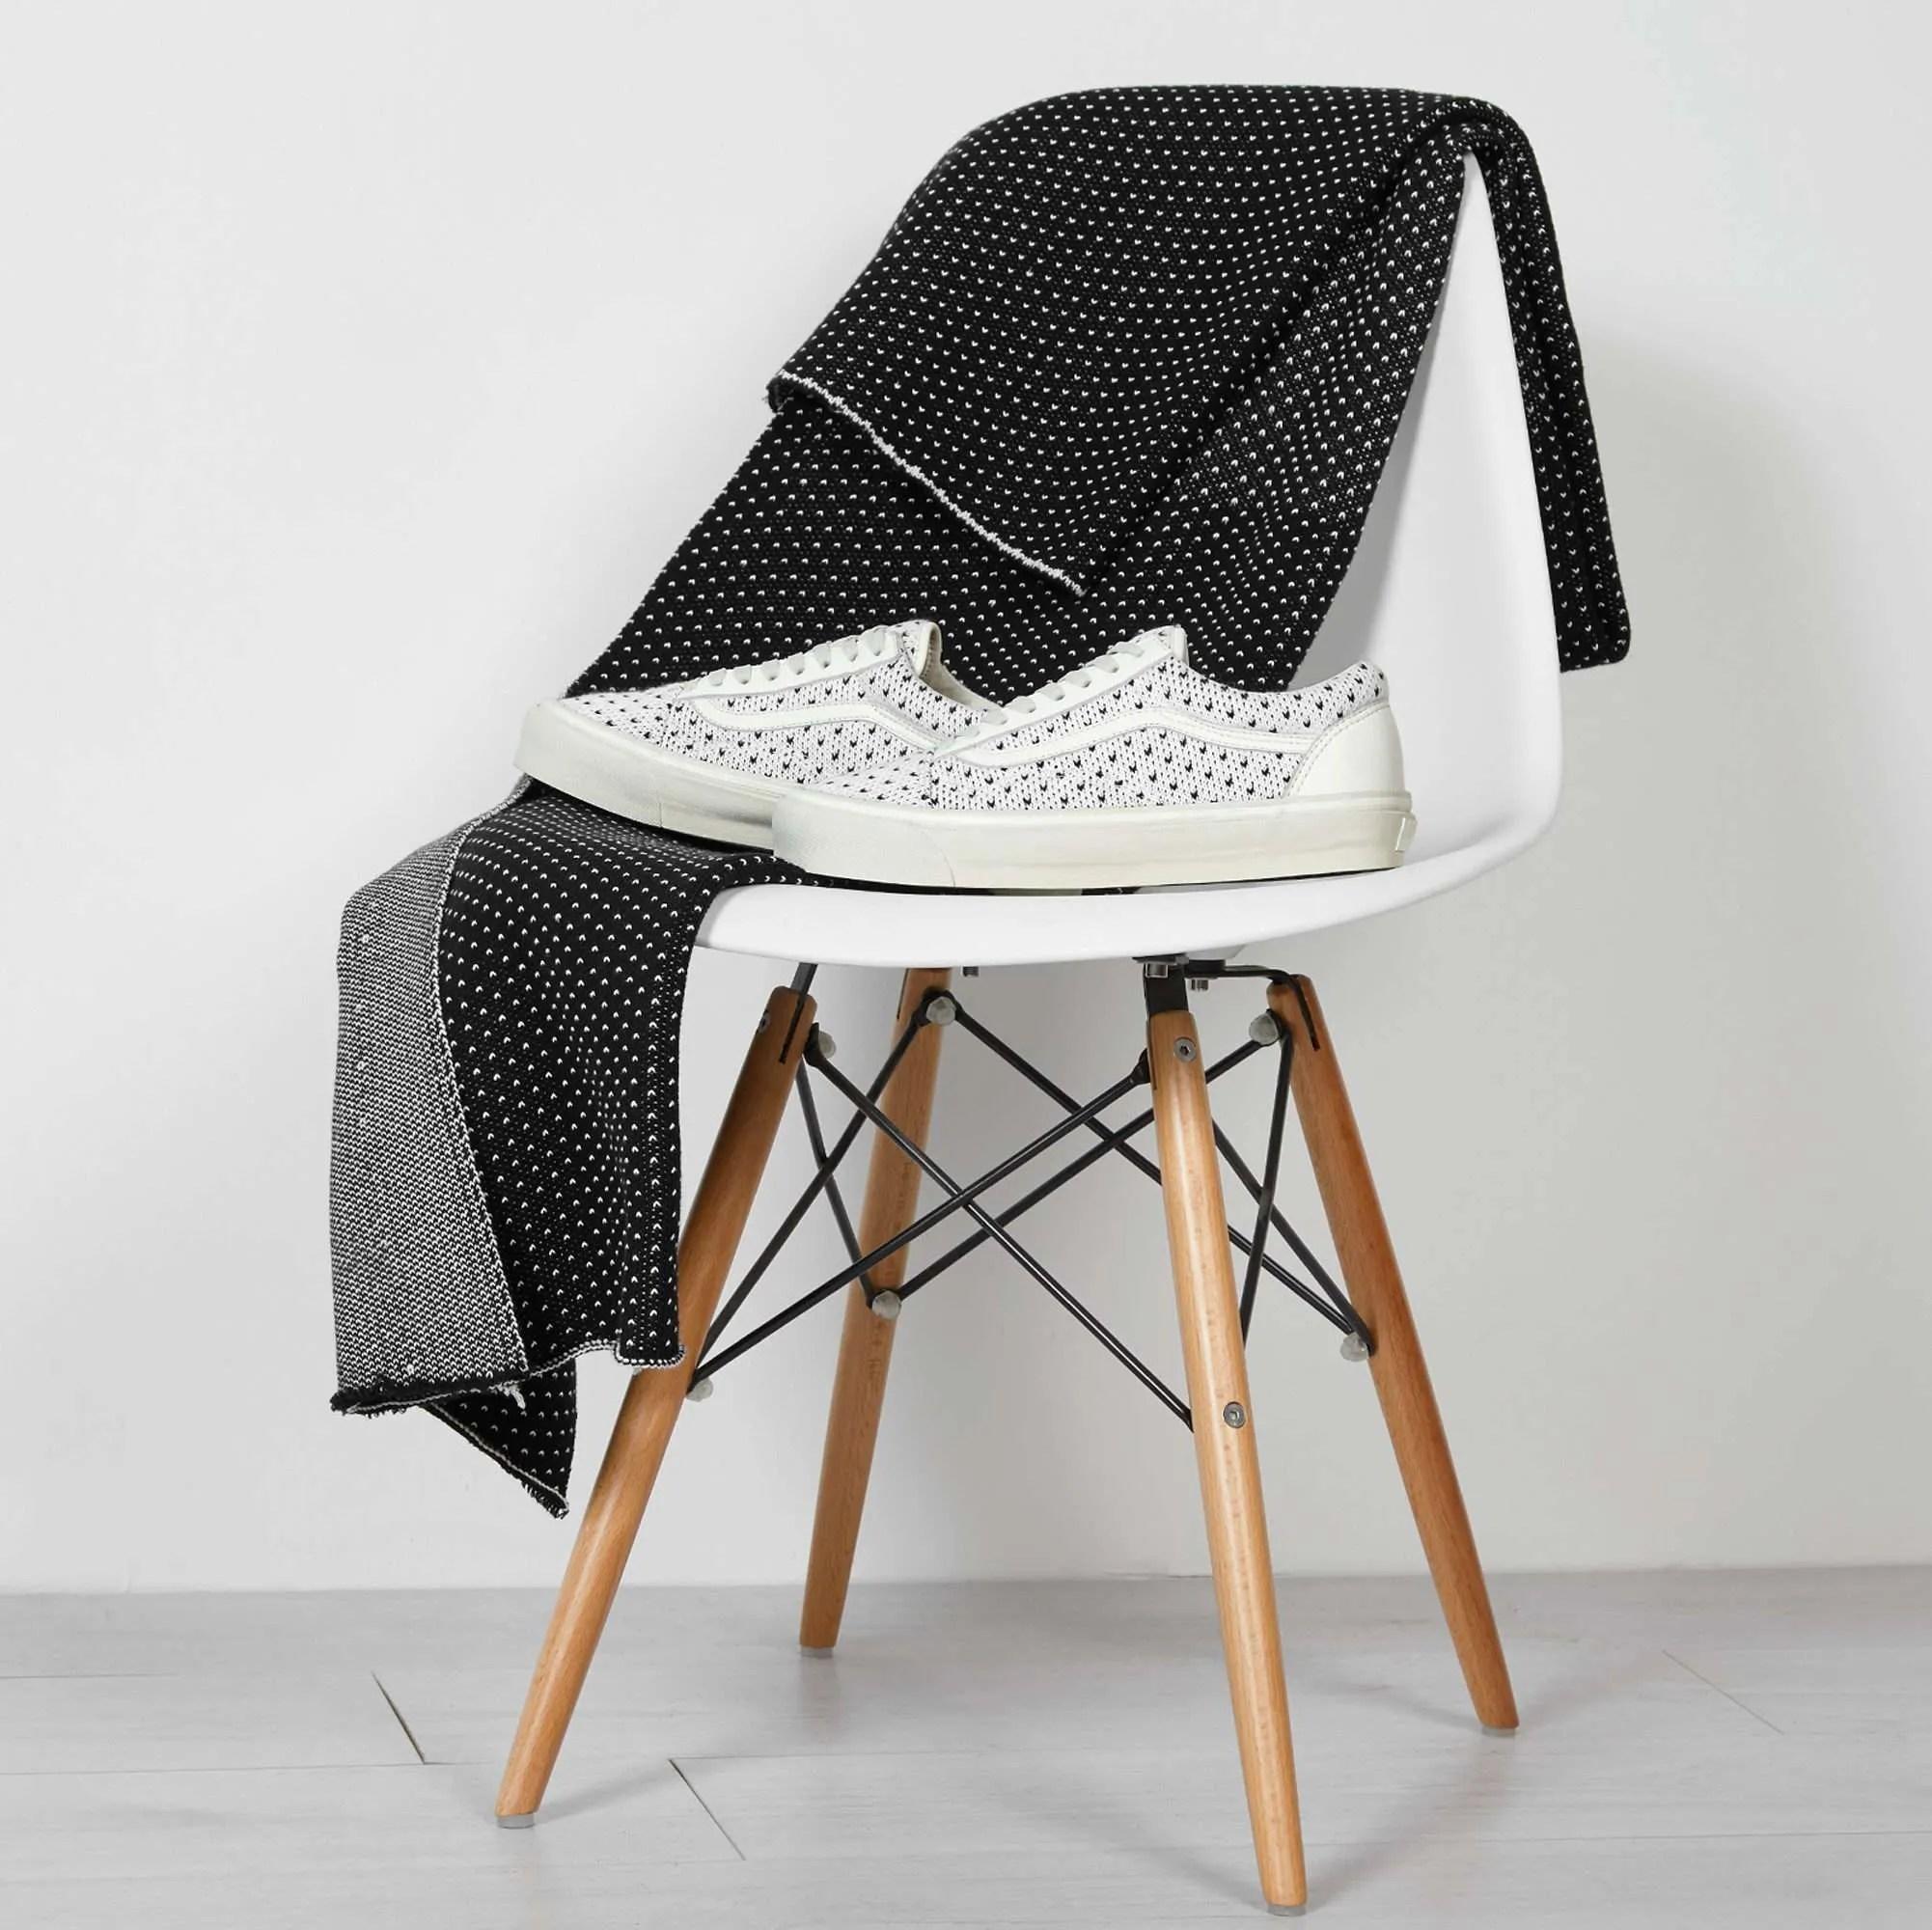 e48f72ac877 END. x Vans OG Old Skool LX  Nordic Wool  - Crisp Culture